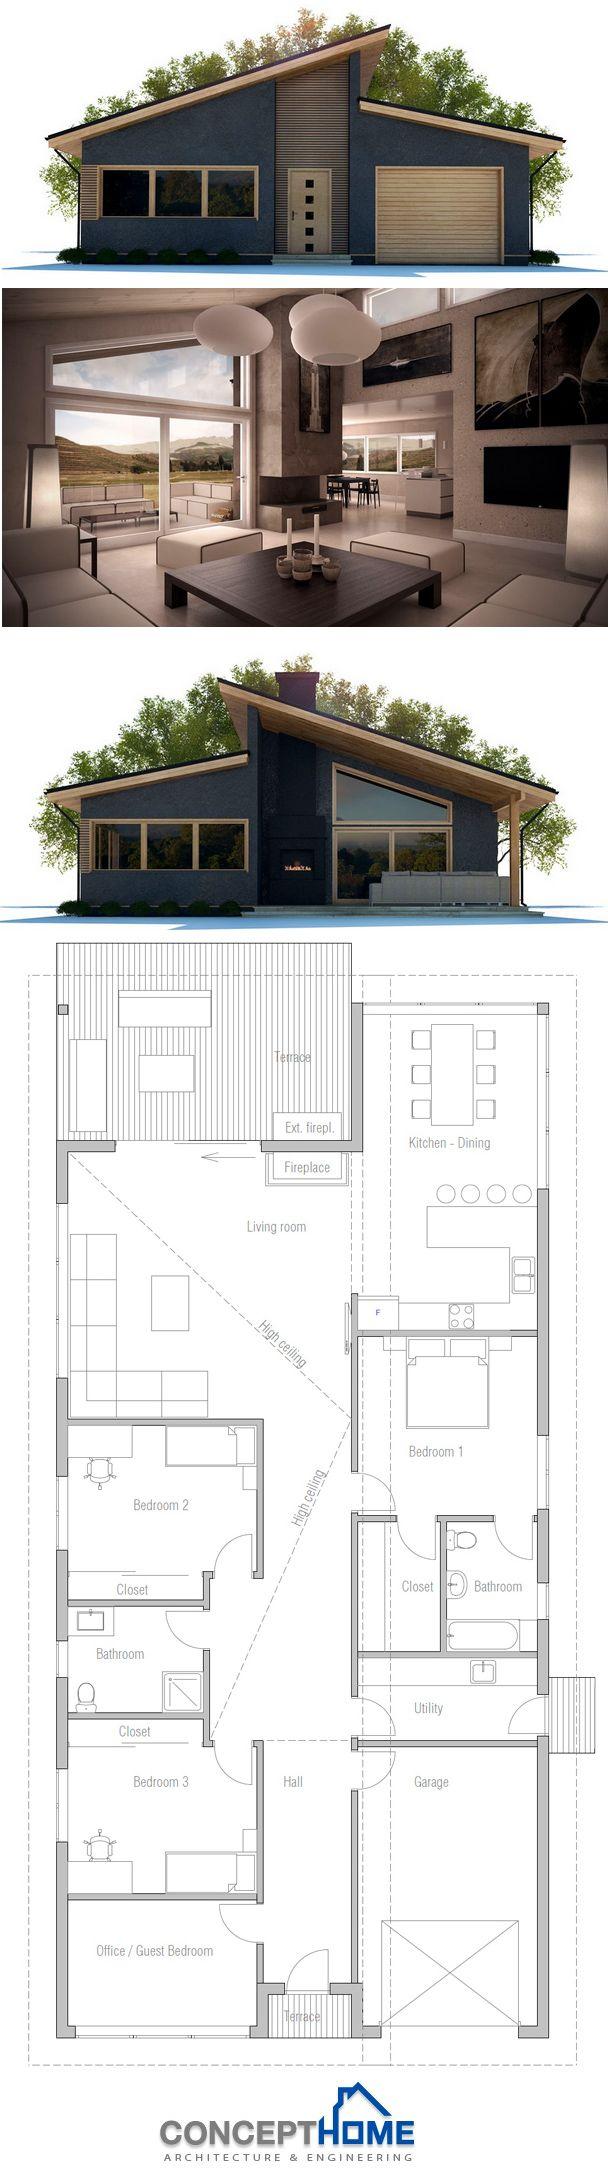 Home Plan | My Home: Facade | Pinterest | Arquitetura, Plantas Baixas E  Projetos De Casas